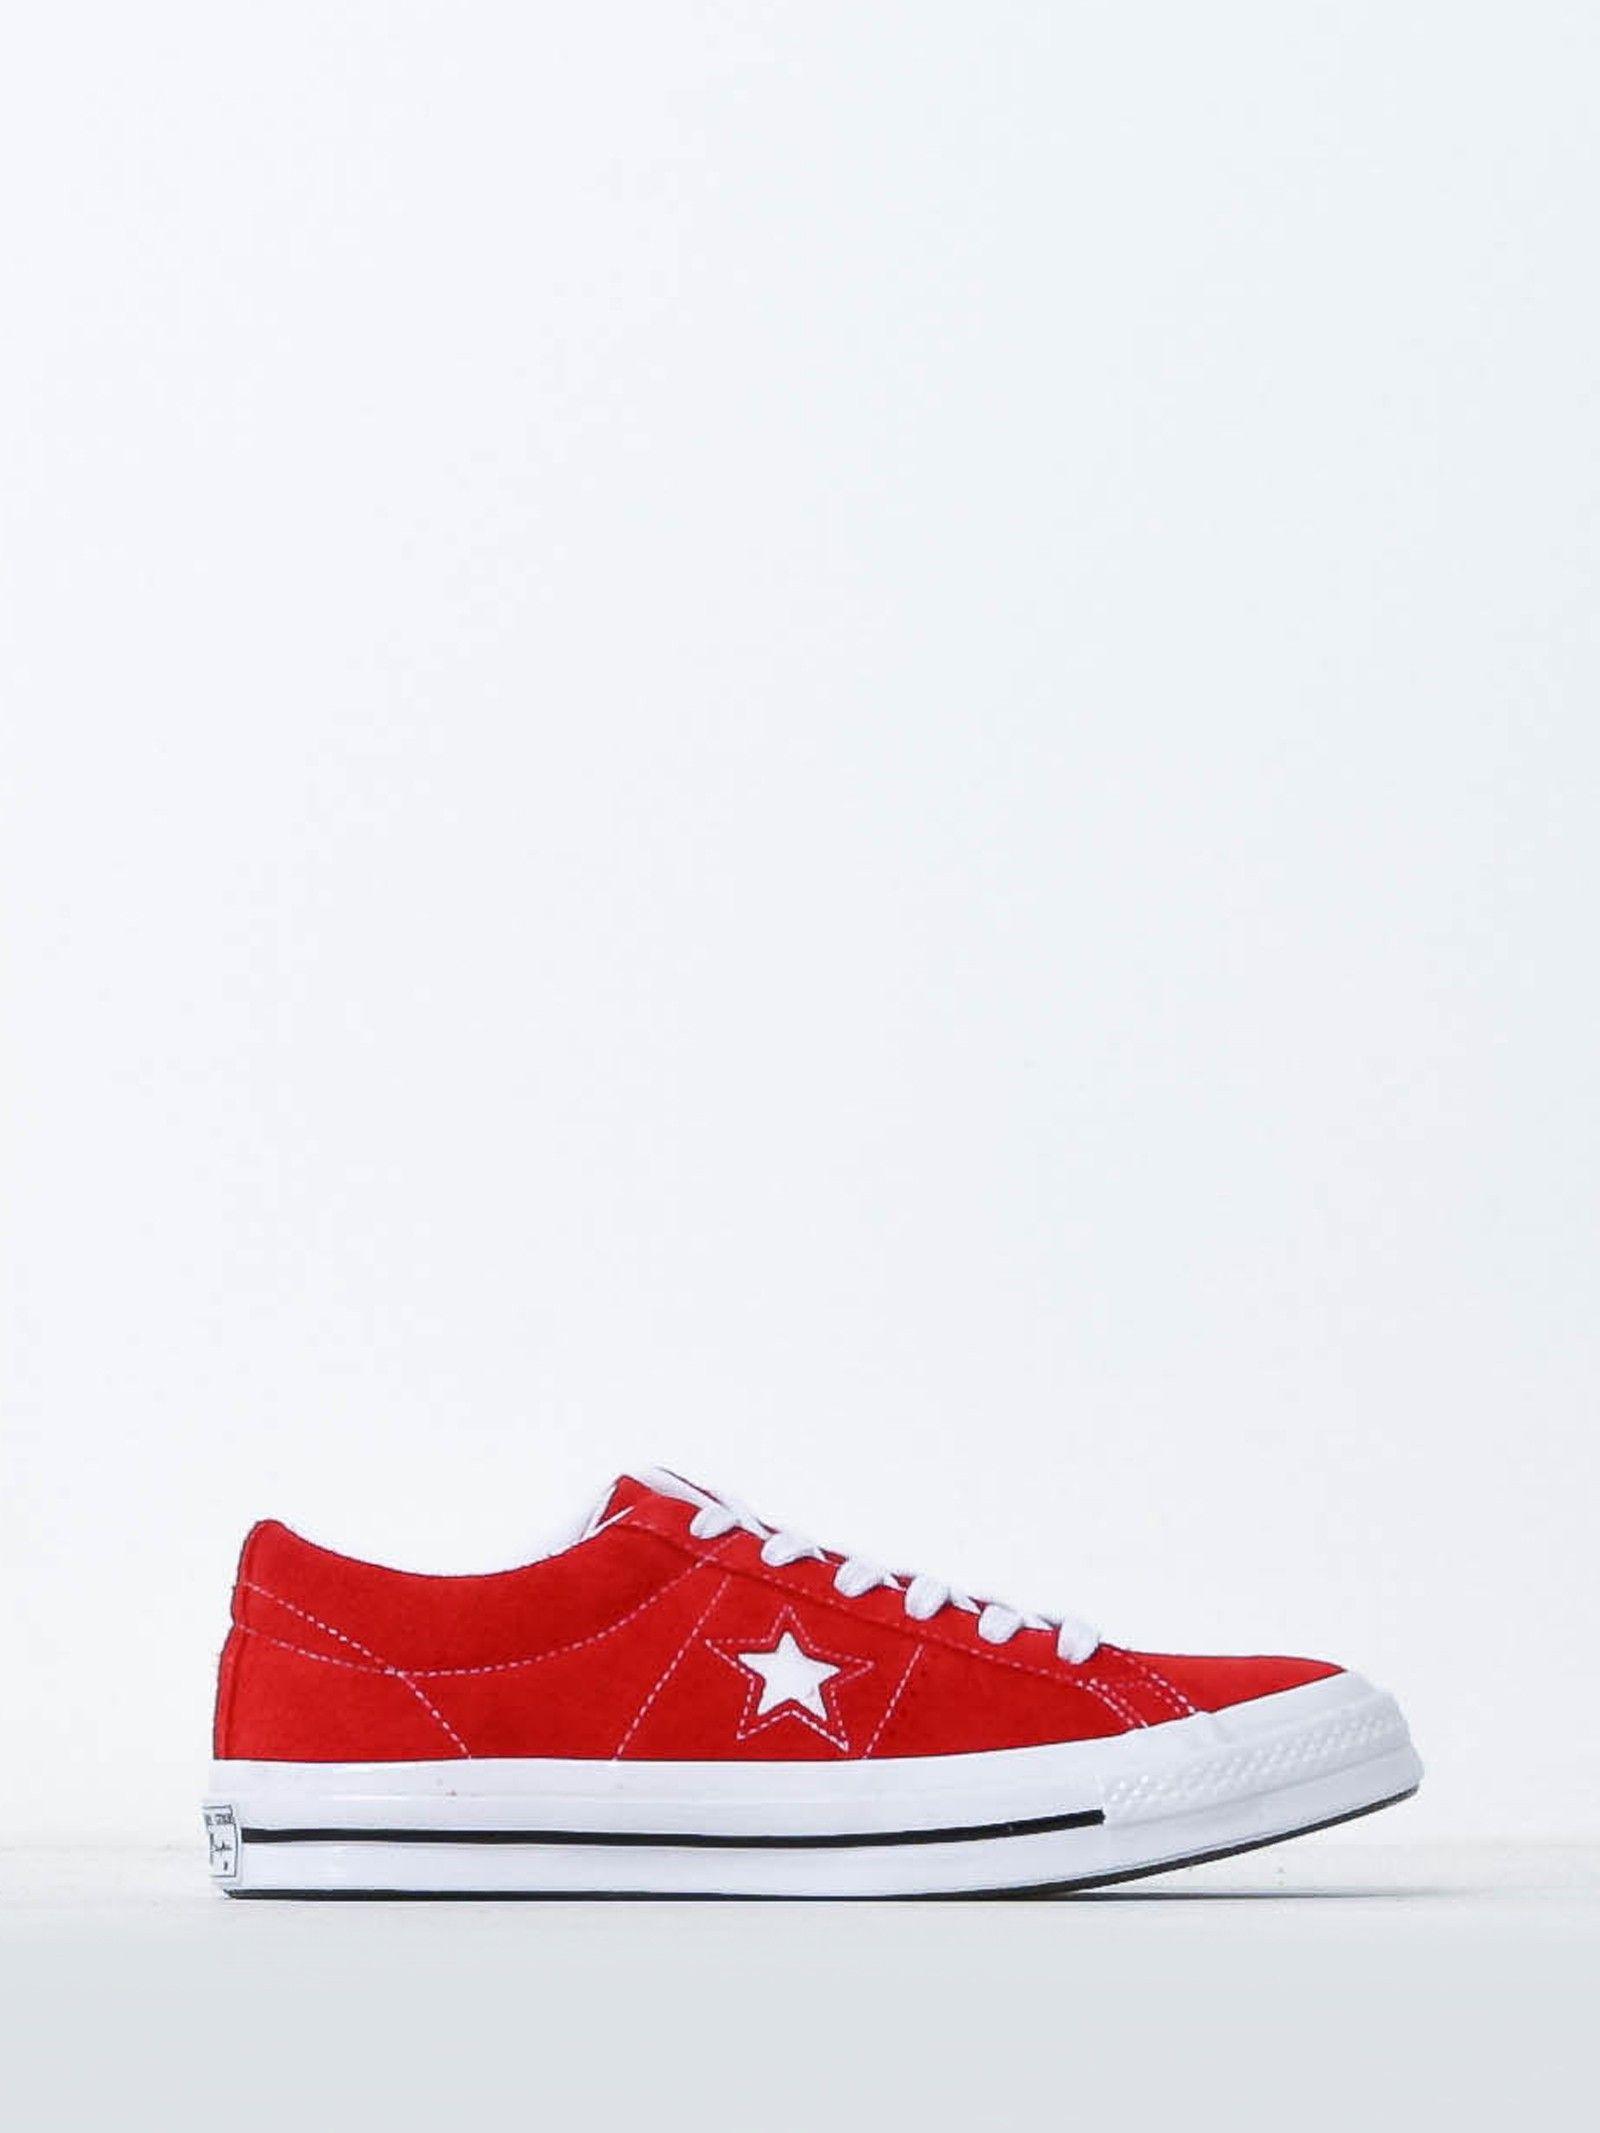 097cff05453735 Converse One Star Premium Suede Sneaker Style Pinterest